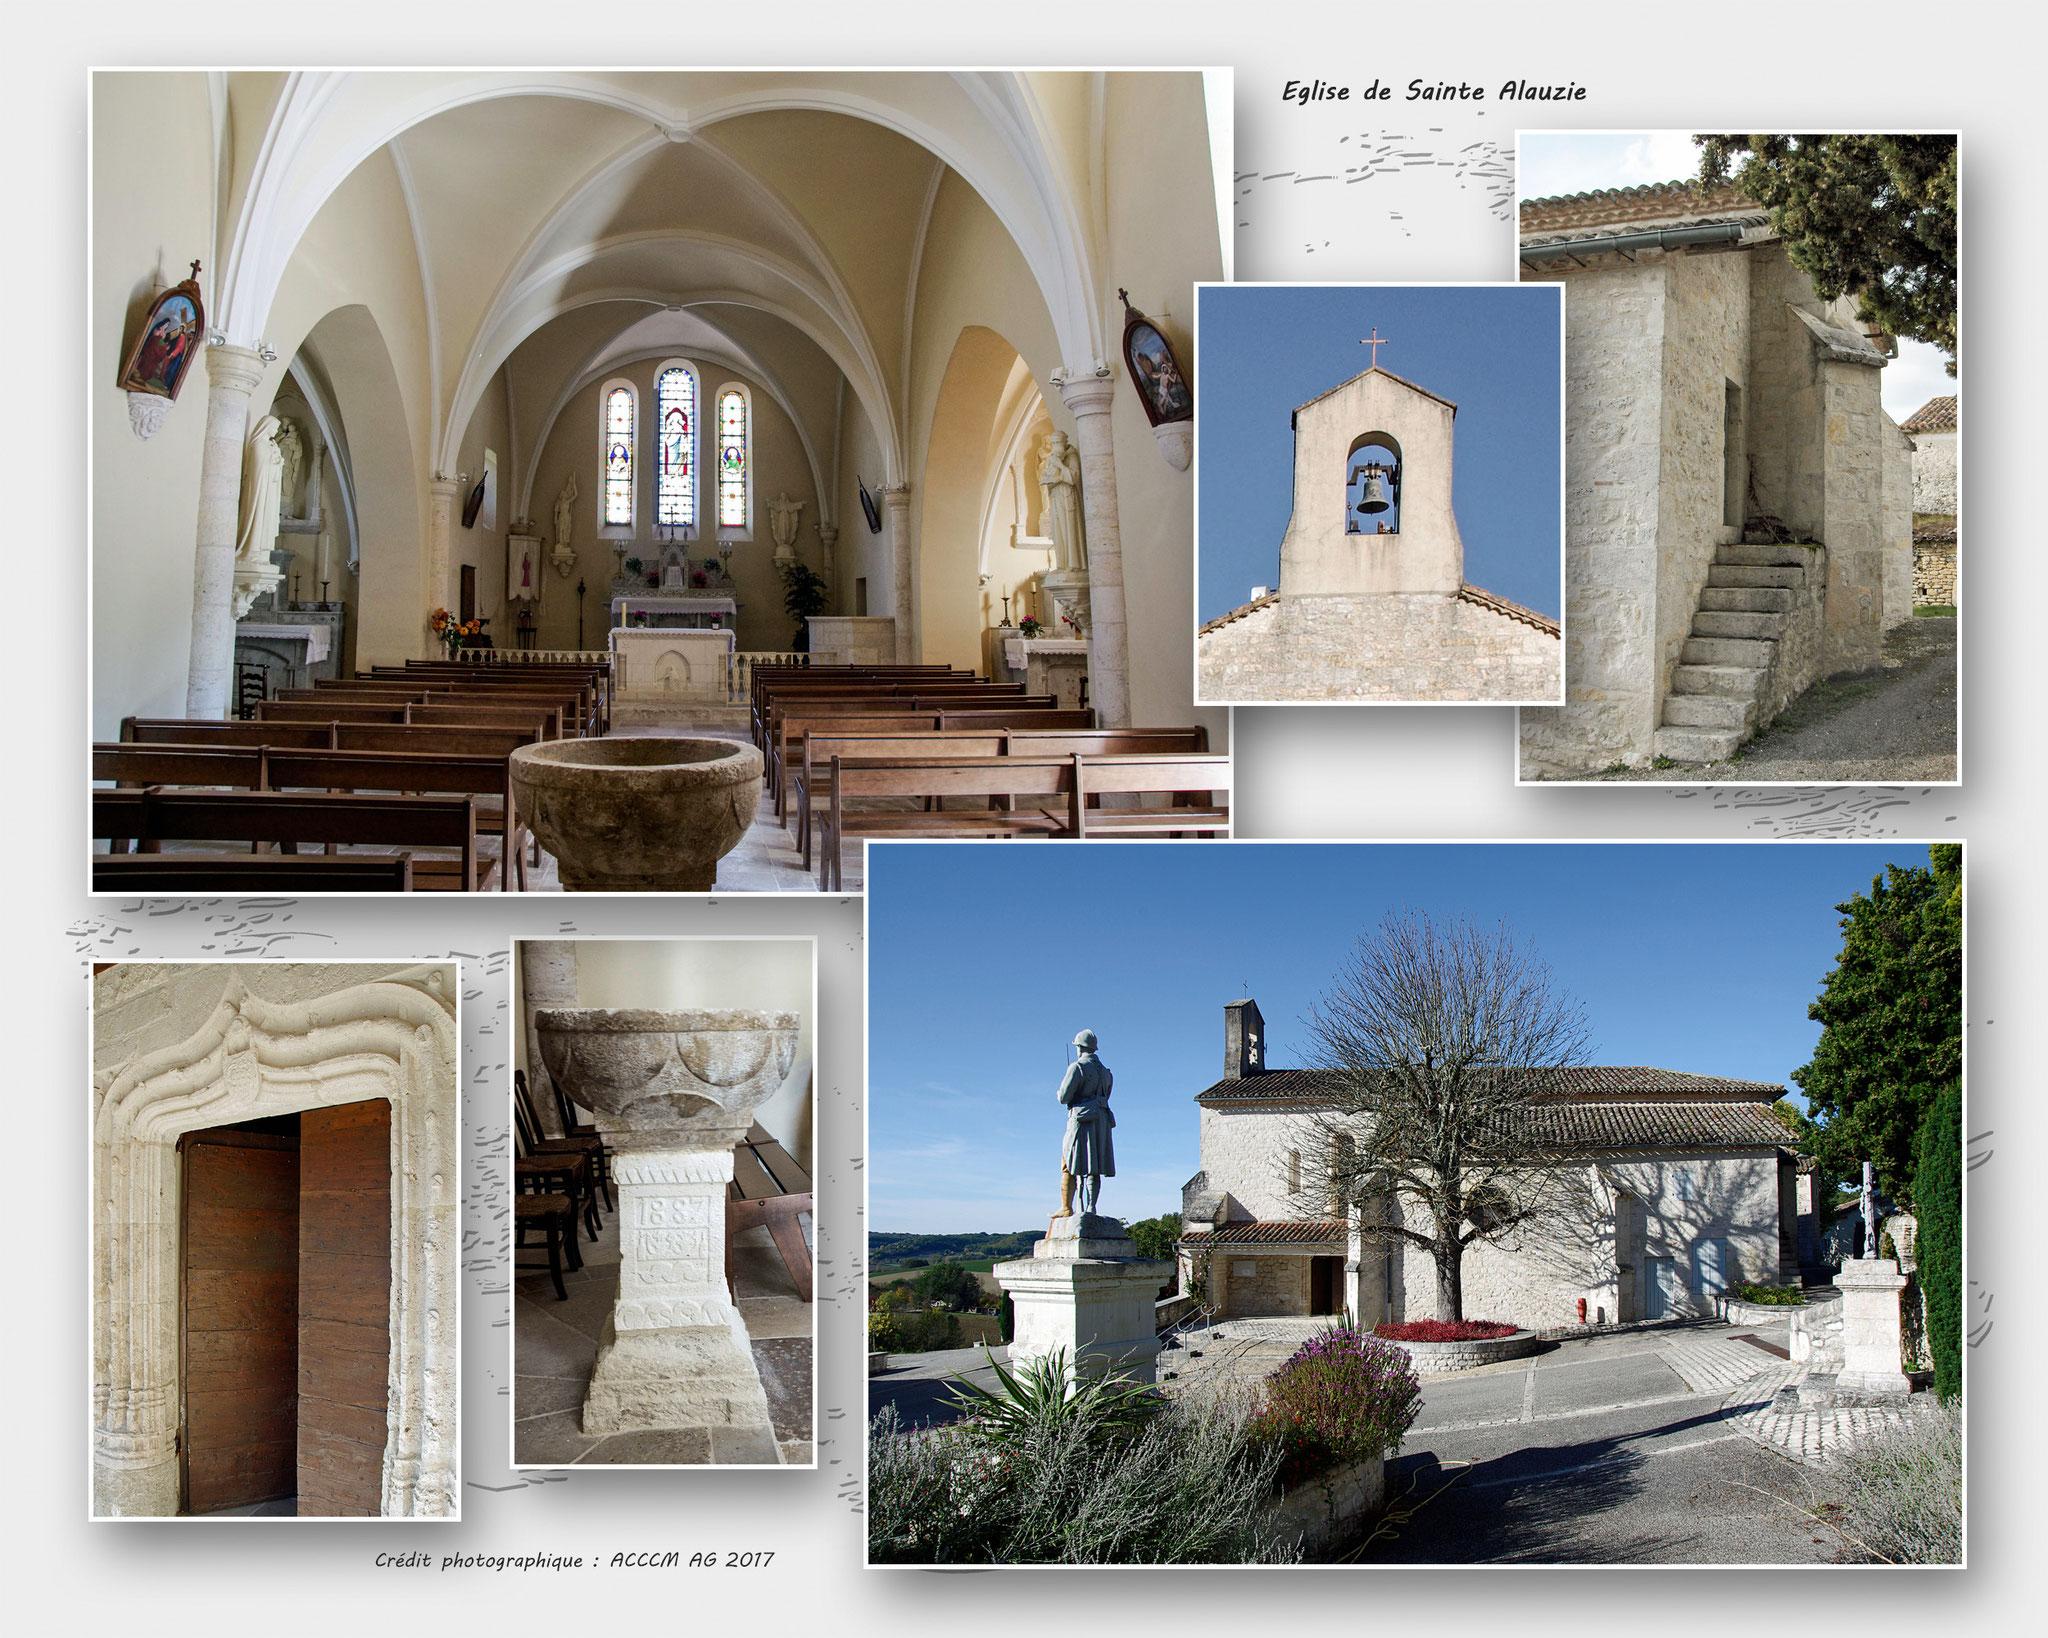 Eglise de Sainte Alauzie